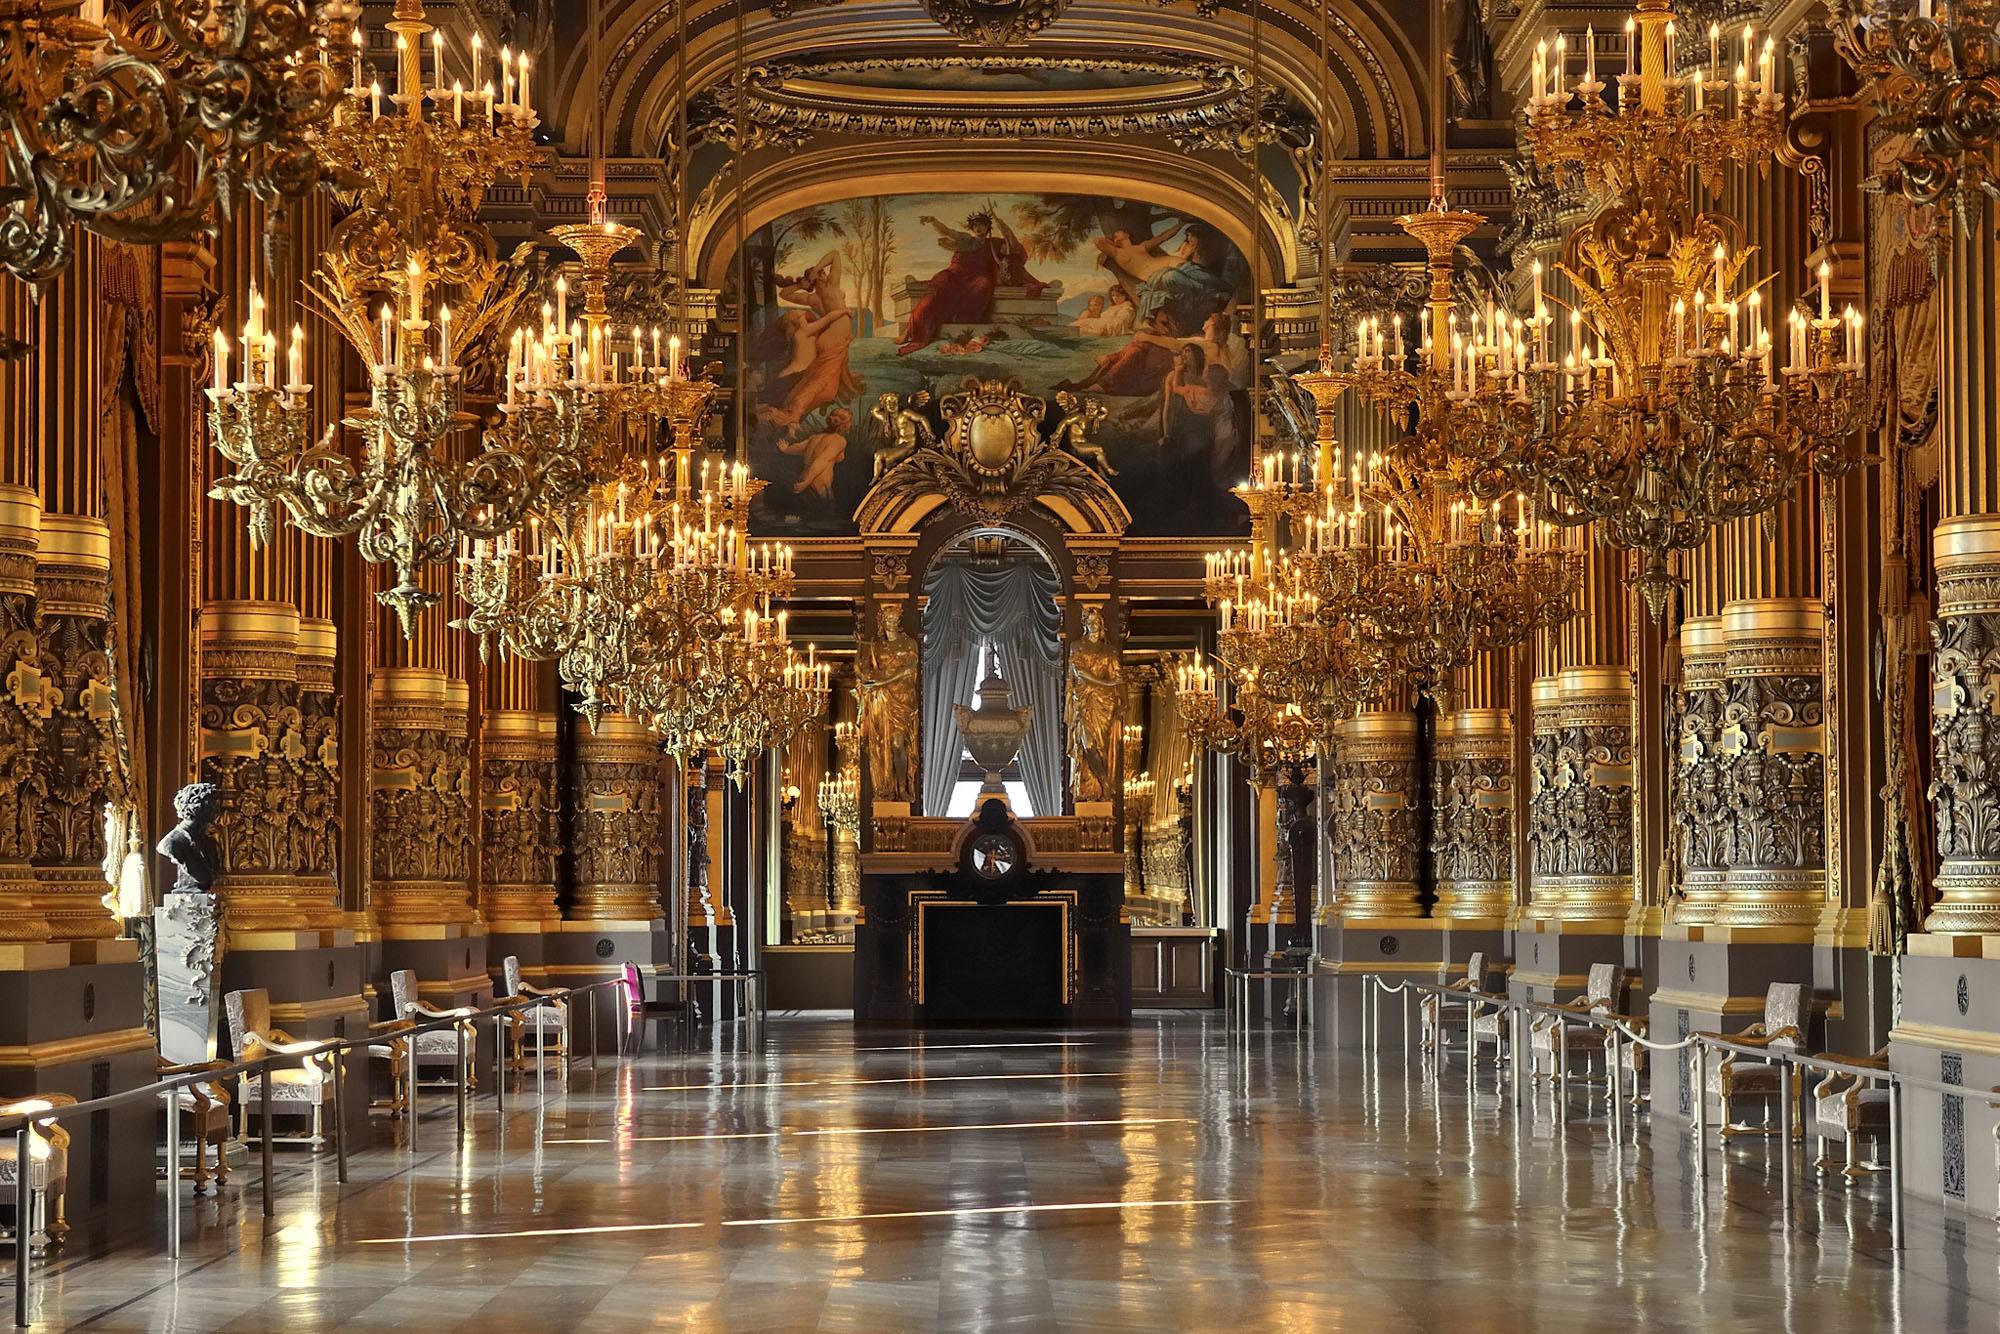 Opera Garnier Grand Foyer